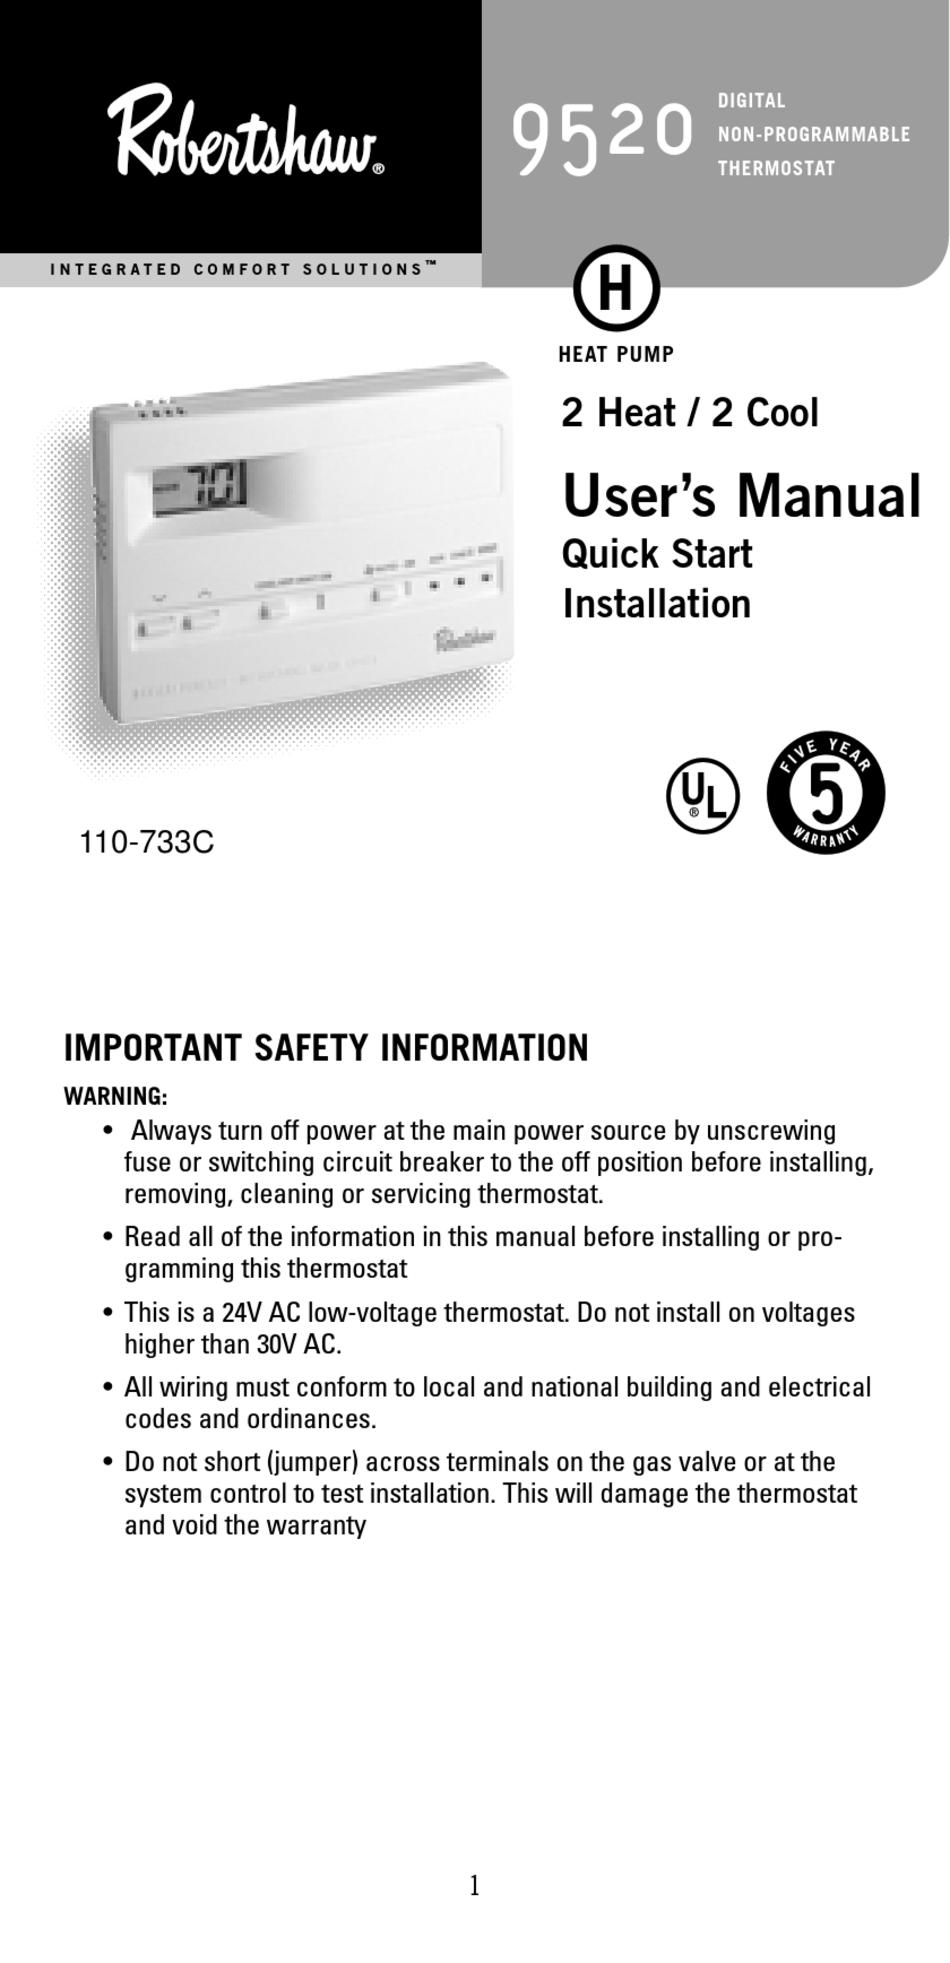 ROBERTSHAW 9520 USER MANUAL Pdf Download | ManualsLibManualsLib